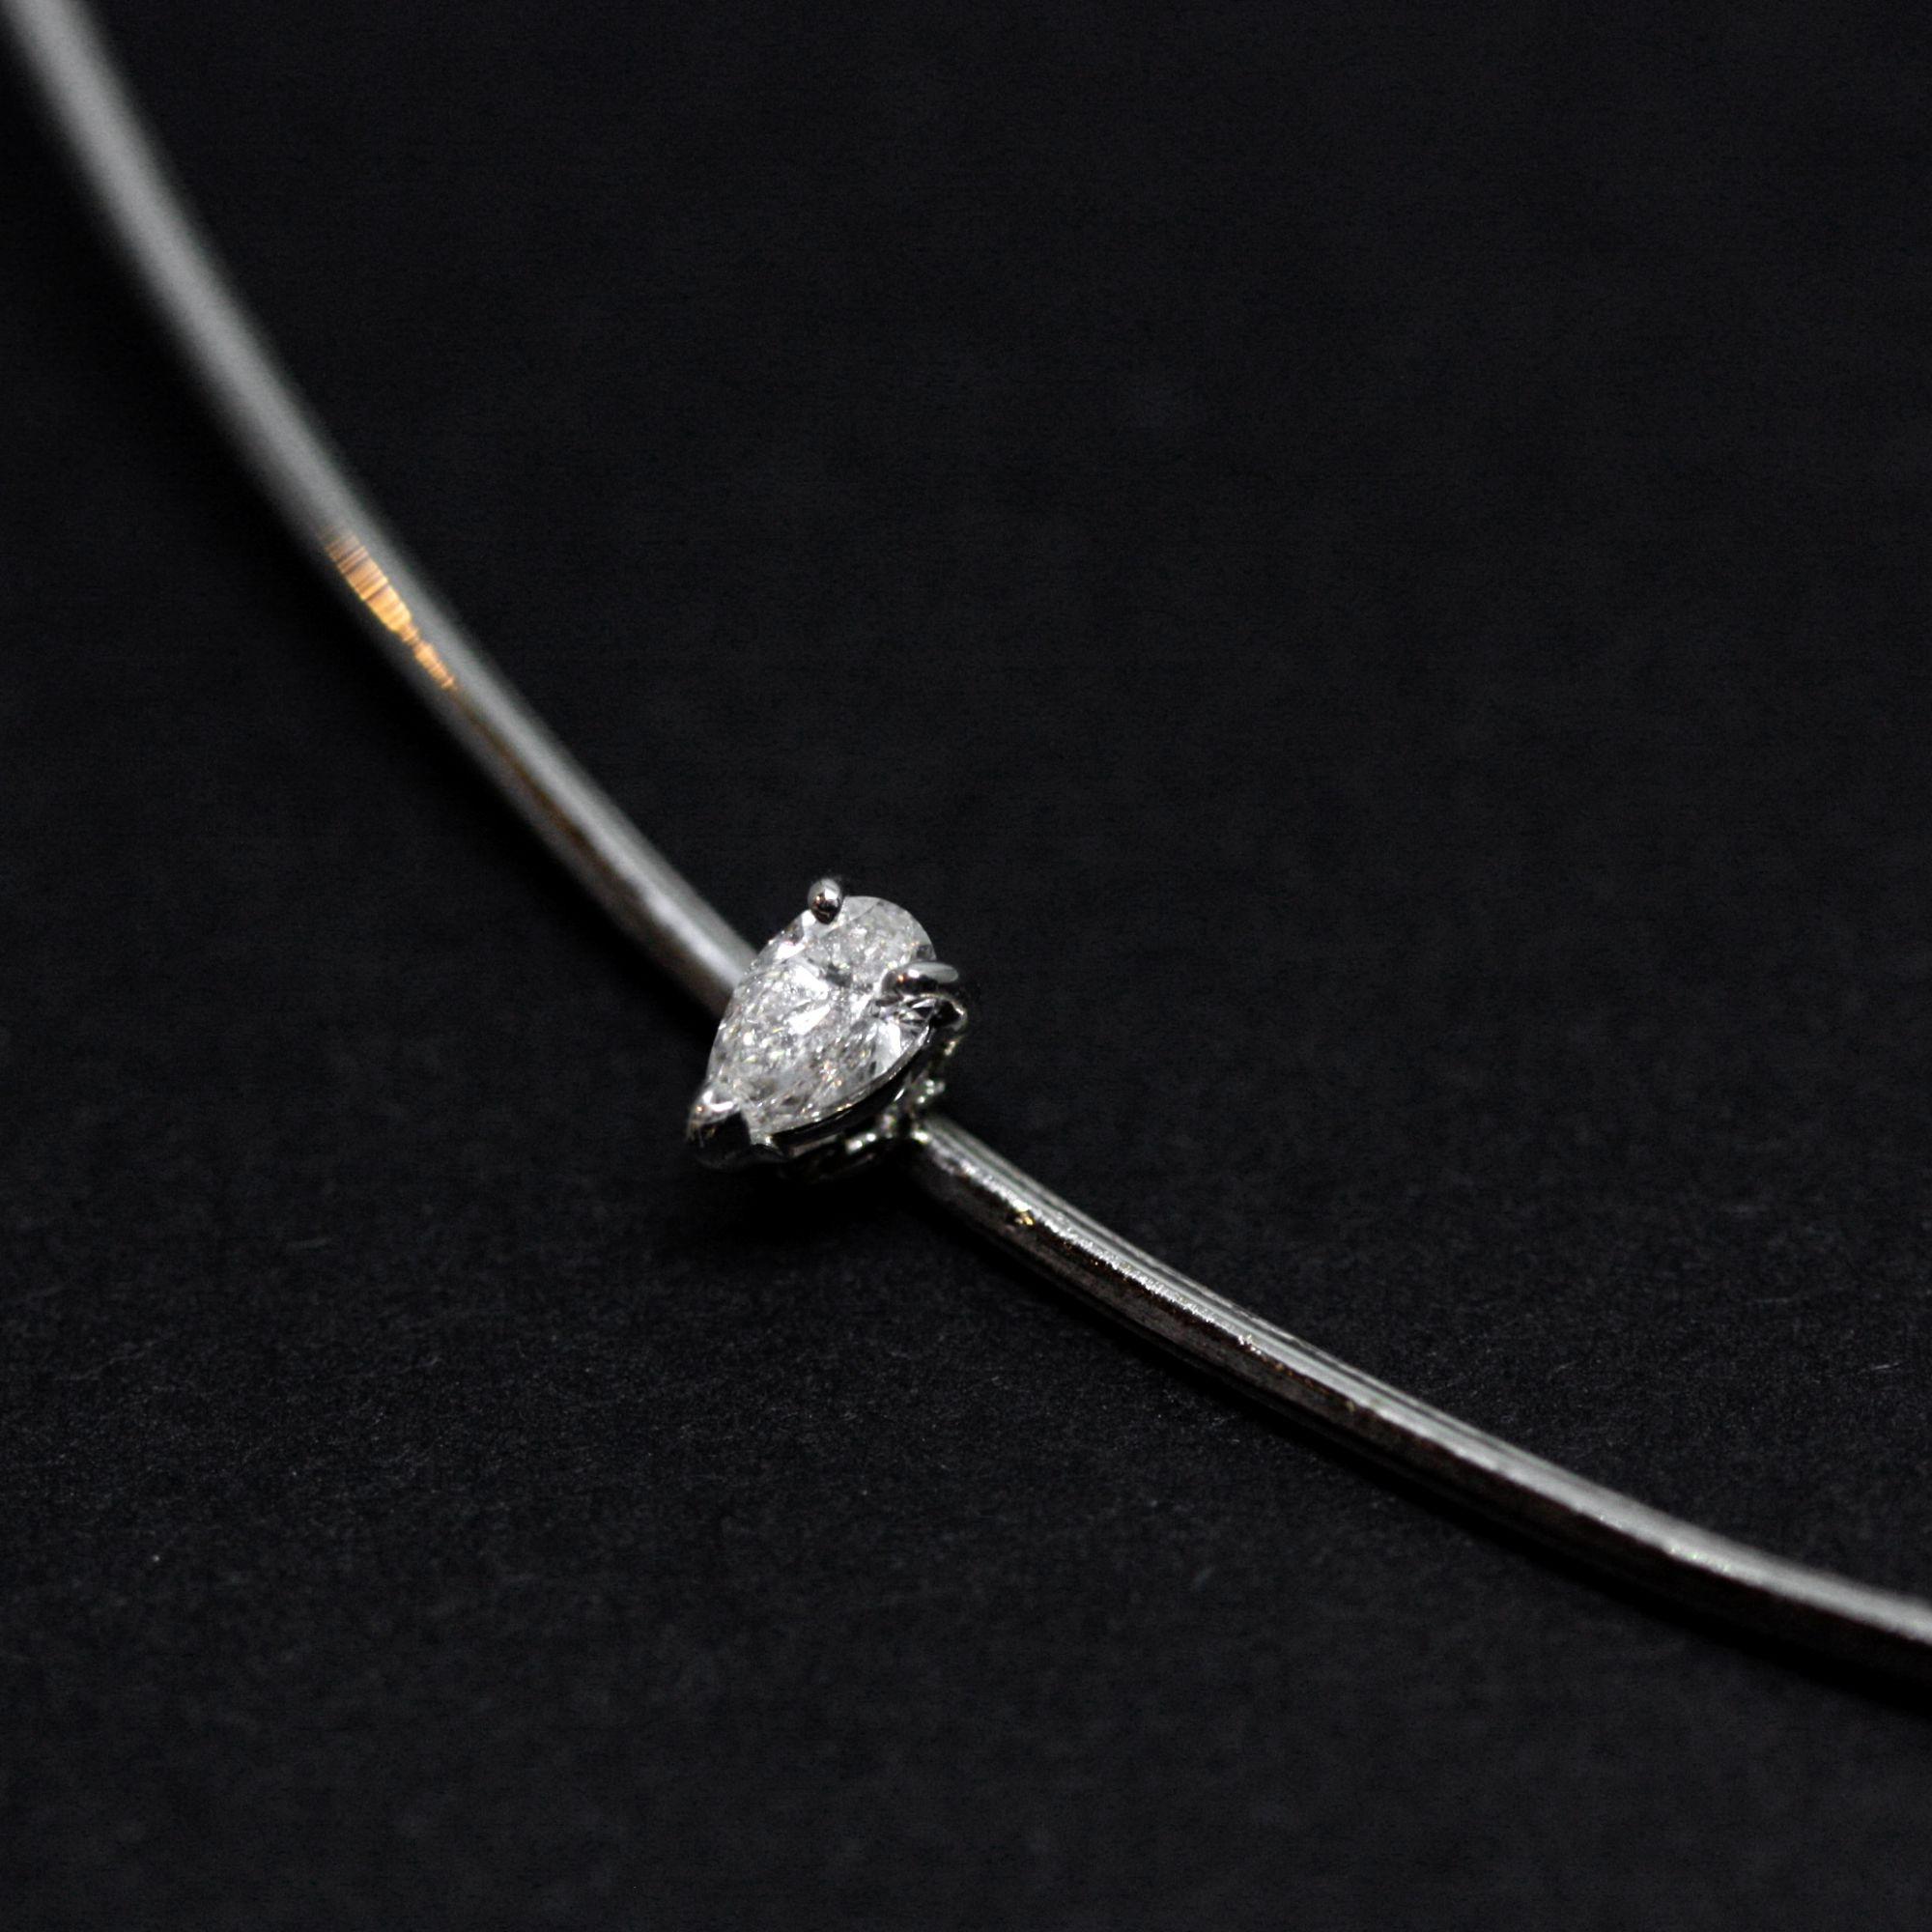 White gold 'Balance' cocker White gold necklace with white diamonds